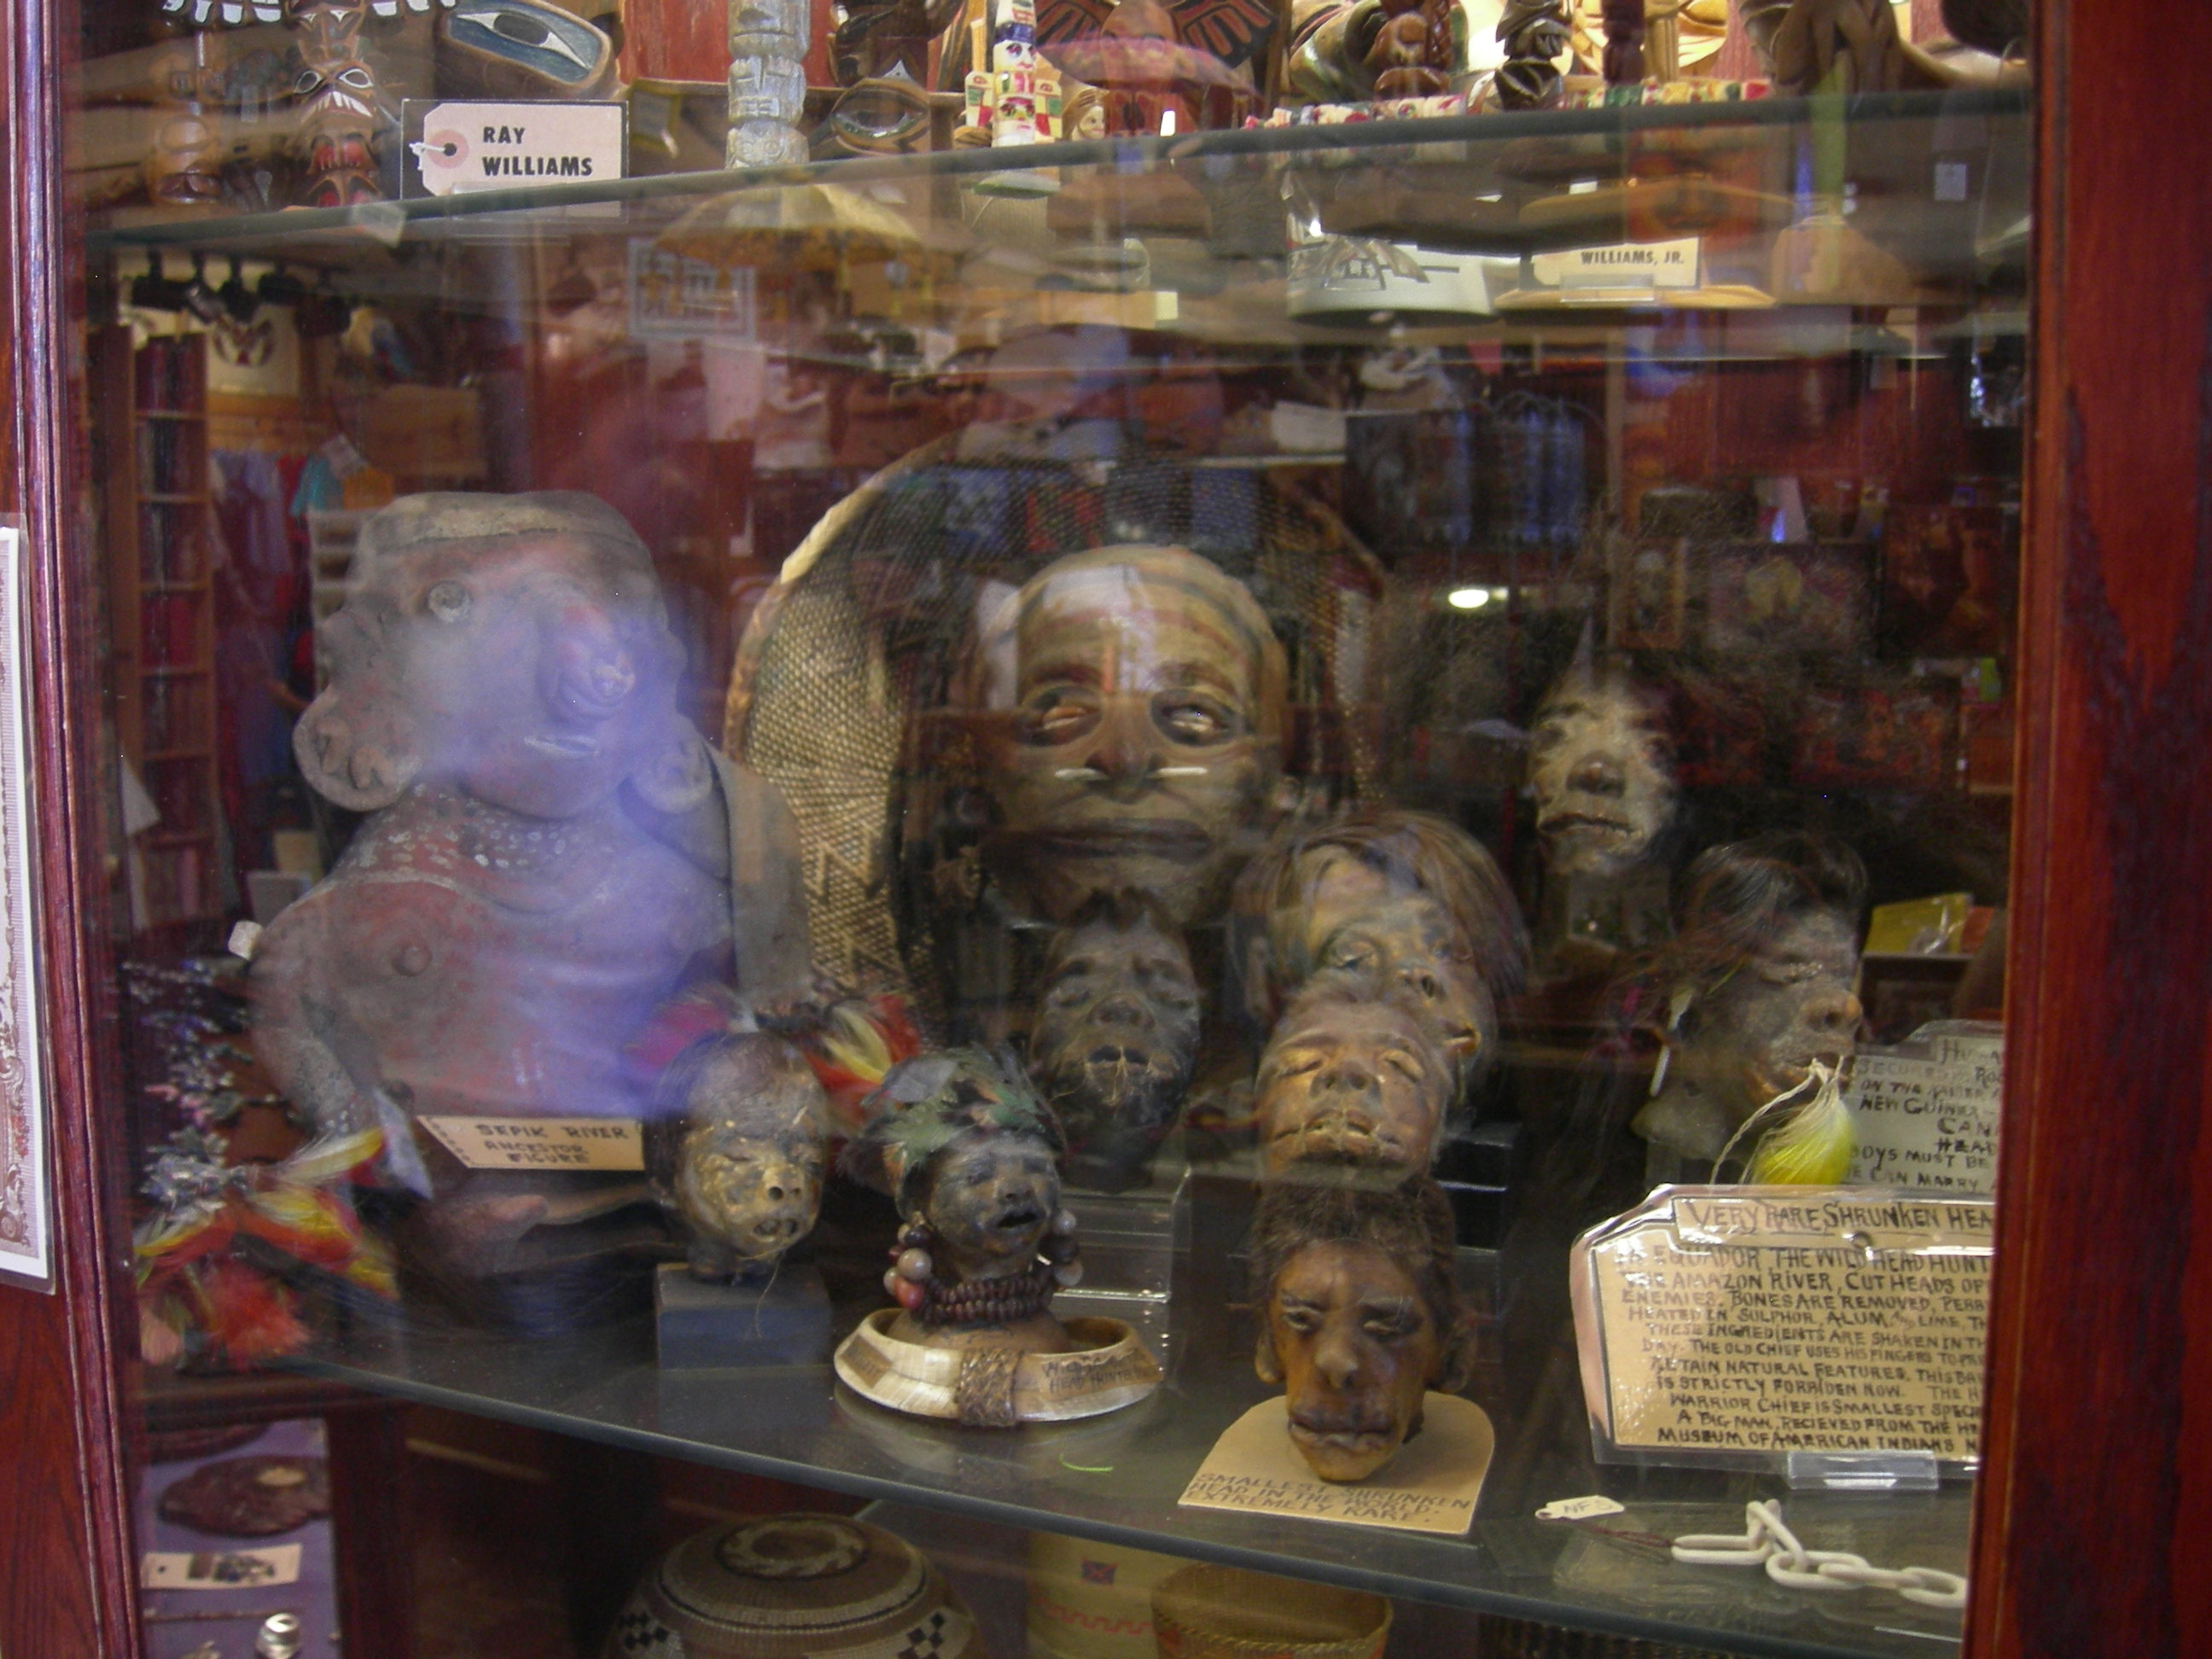 Seattle_-_Curiosity_Shop_shrunken_heads_01